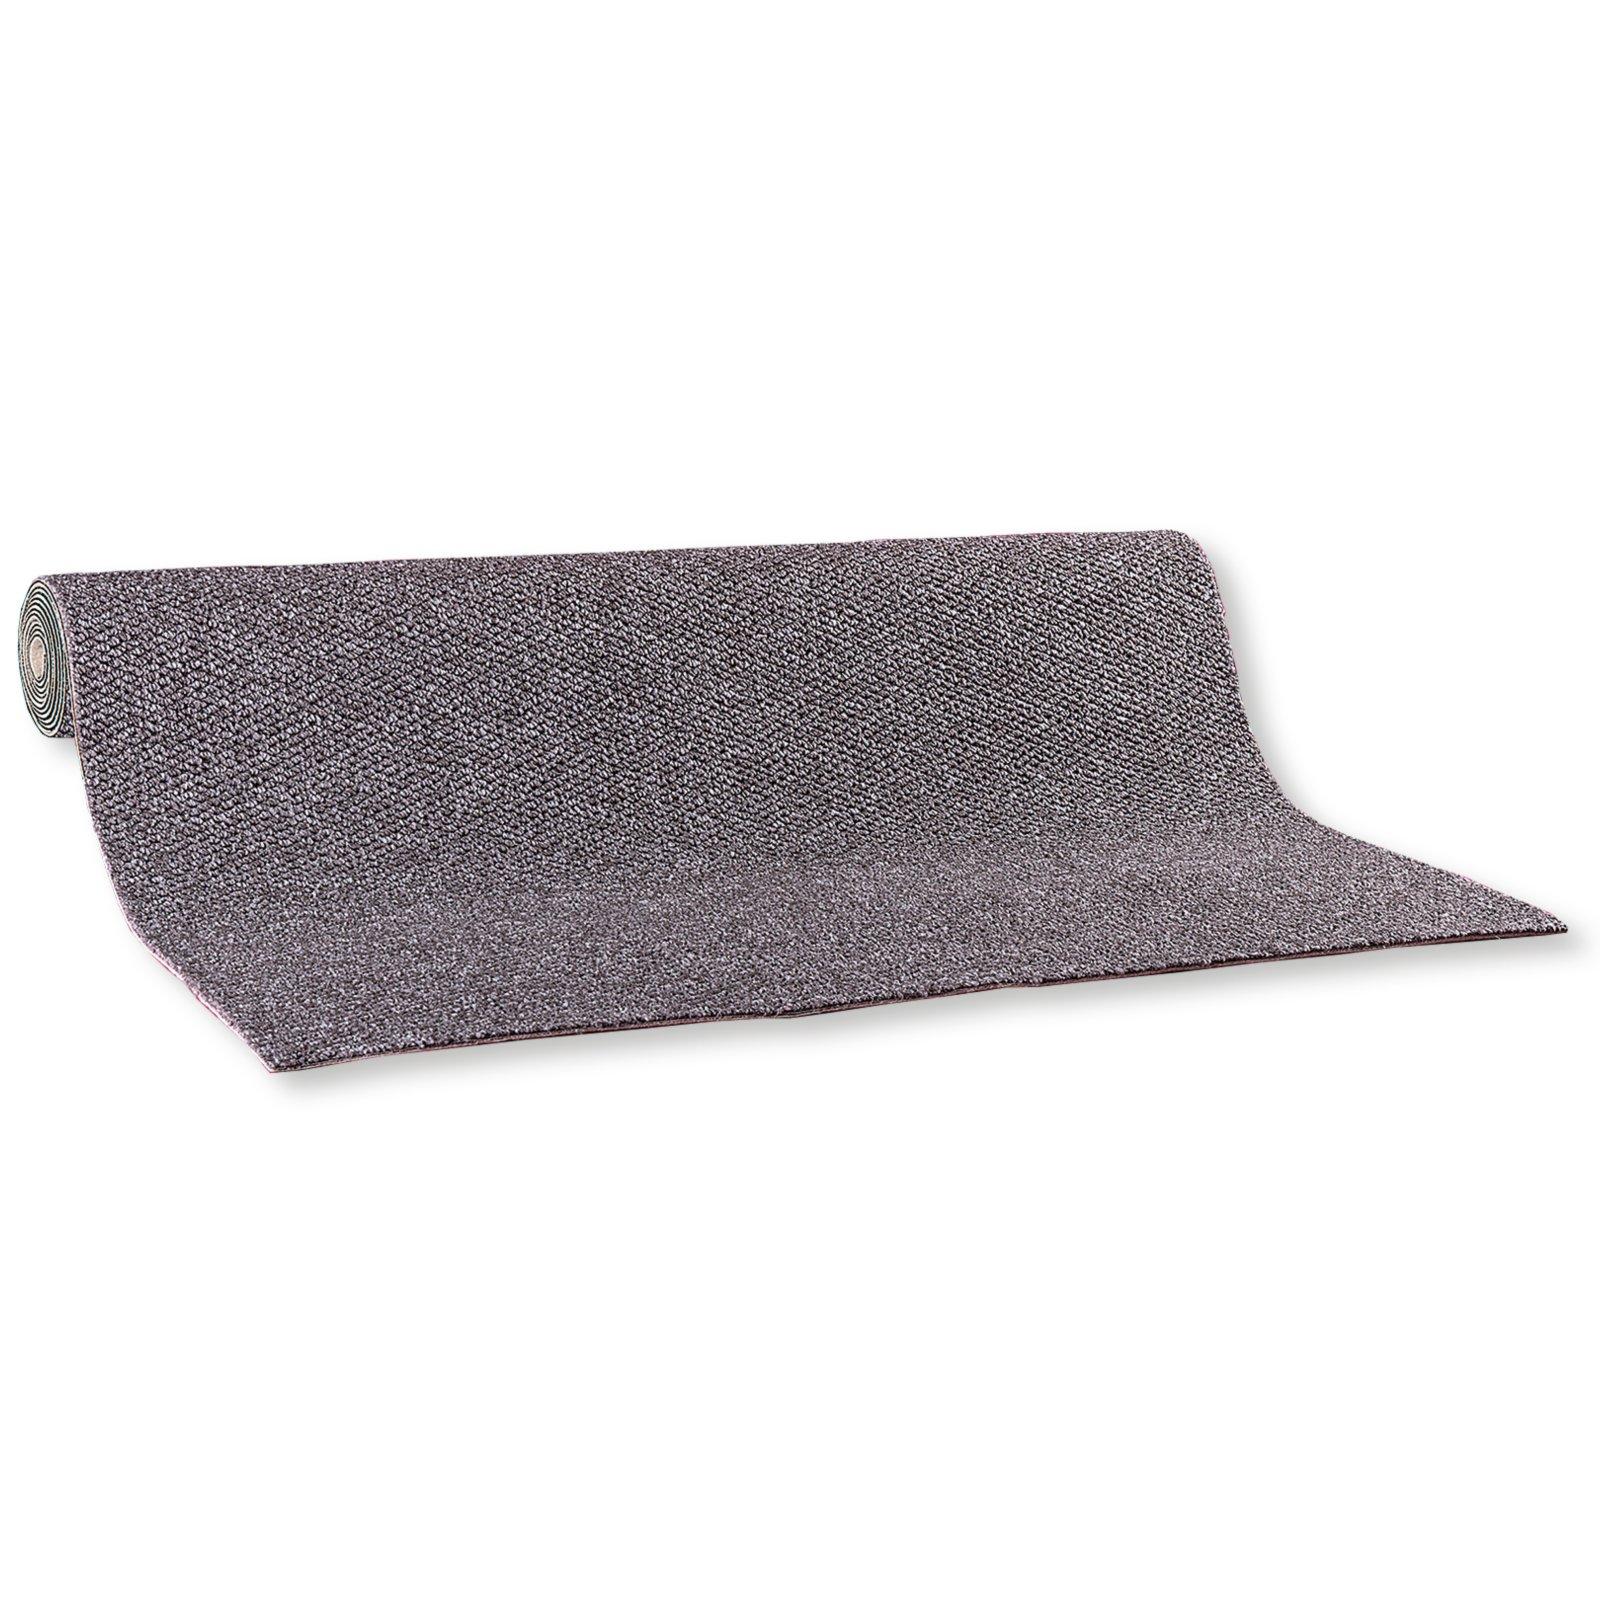 teppichboden rastadt grau 4 meter breit teppichboden bodenbel ge baumarkt roller. Black Bedroom Furniture Sets. Home Design Ideas